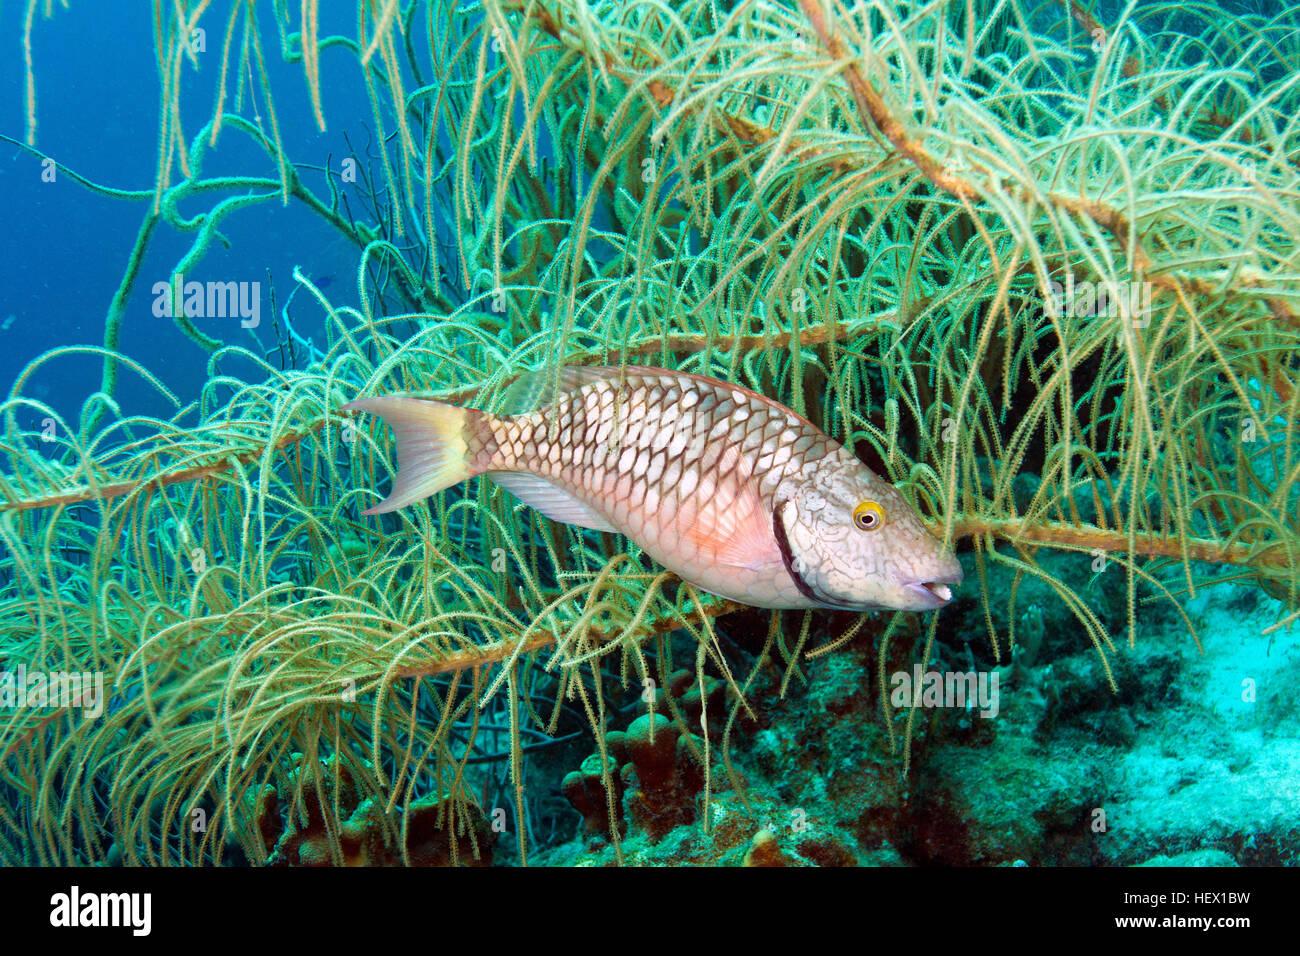 A stoplight parrotfish, Sparisoma viride, foraging for algae in a Caribbean reef. - Stock Image